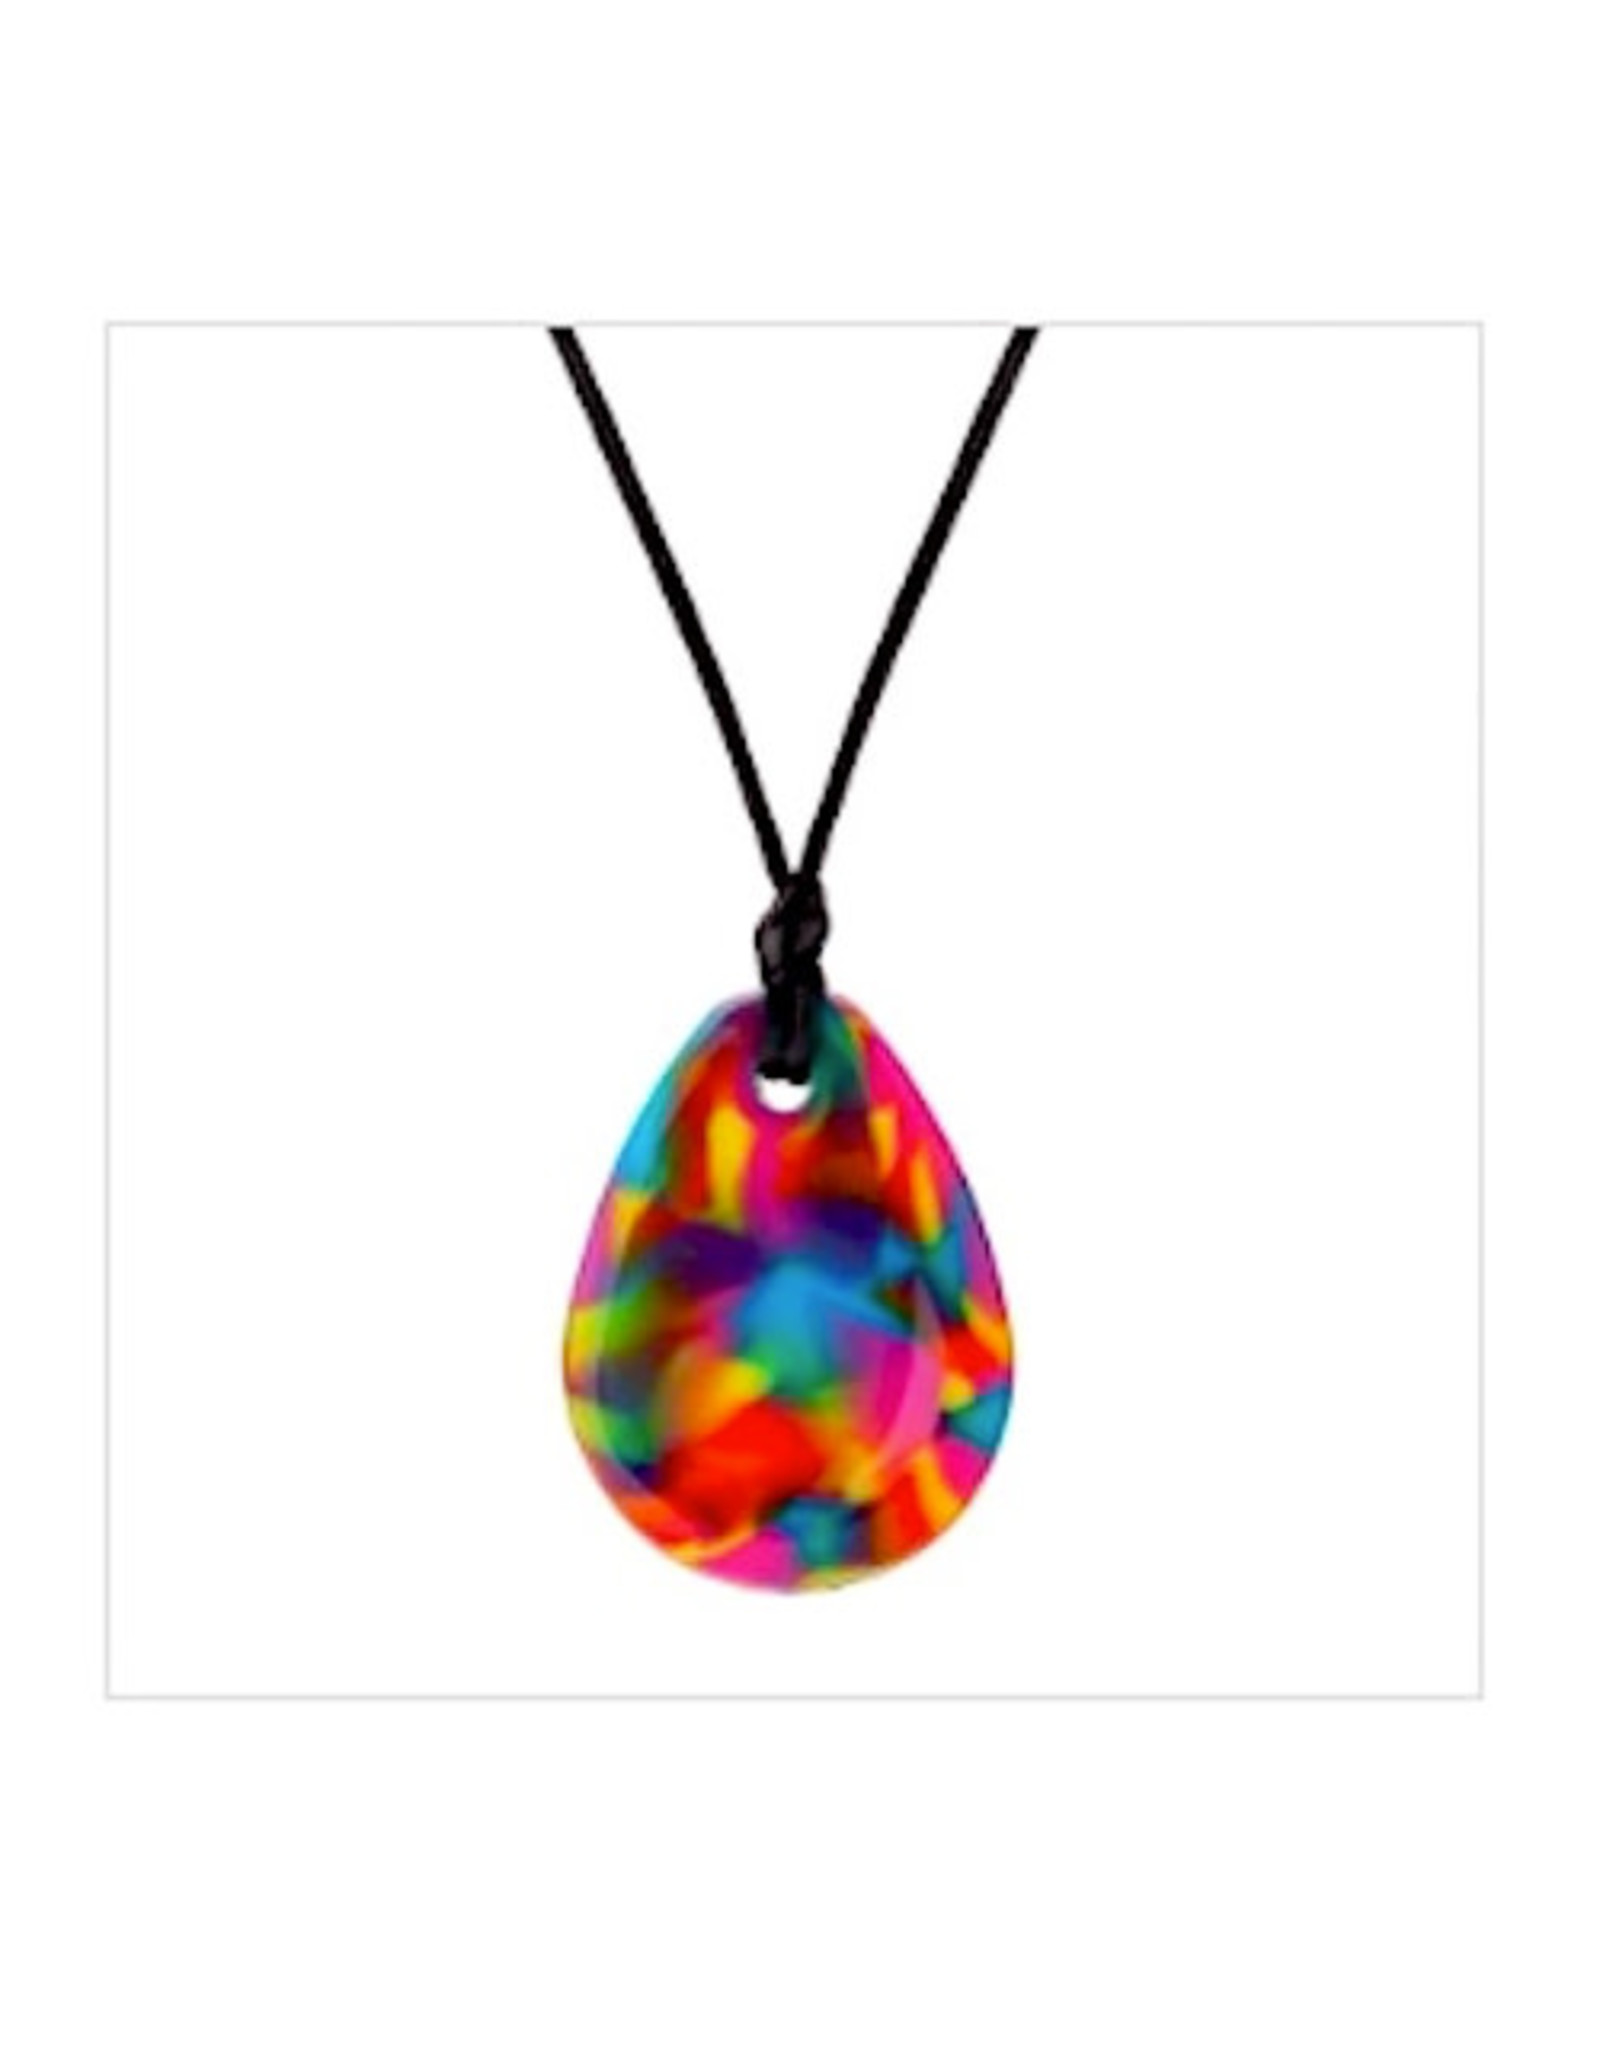 Chewigem Chewlery Raindrop  Necklace